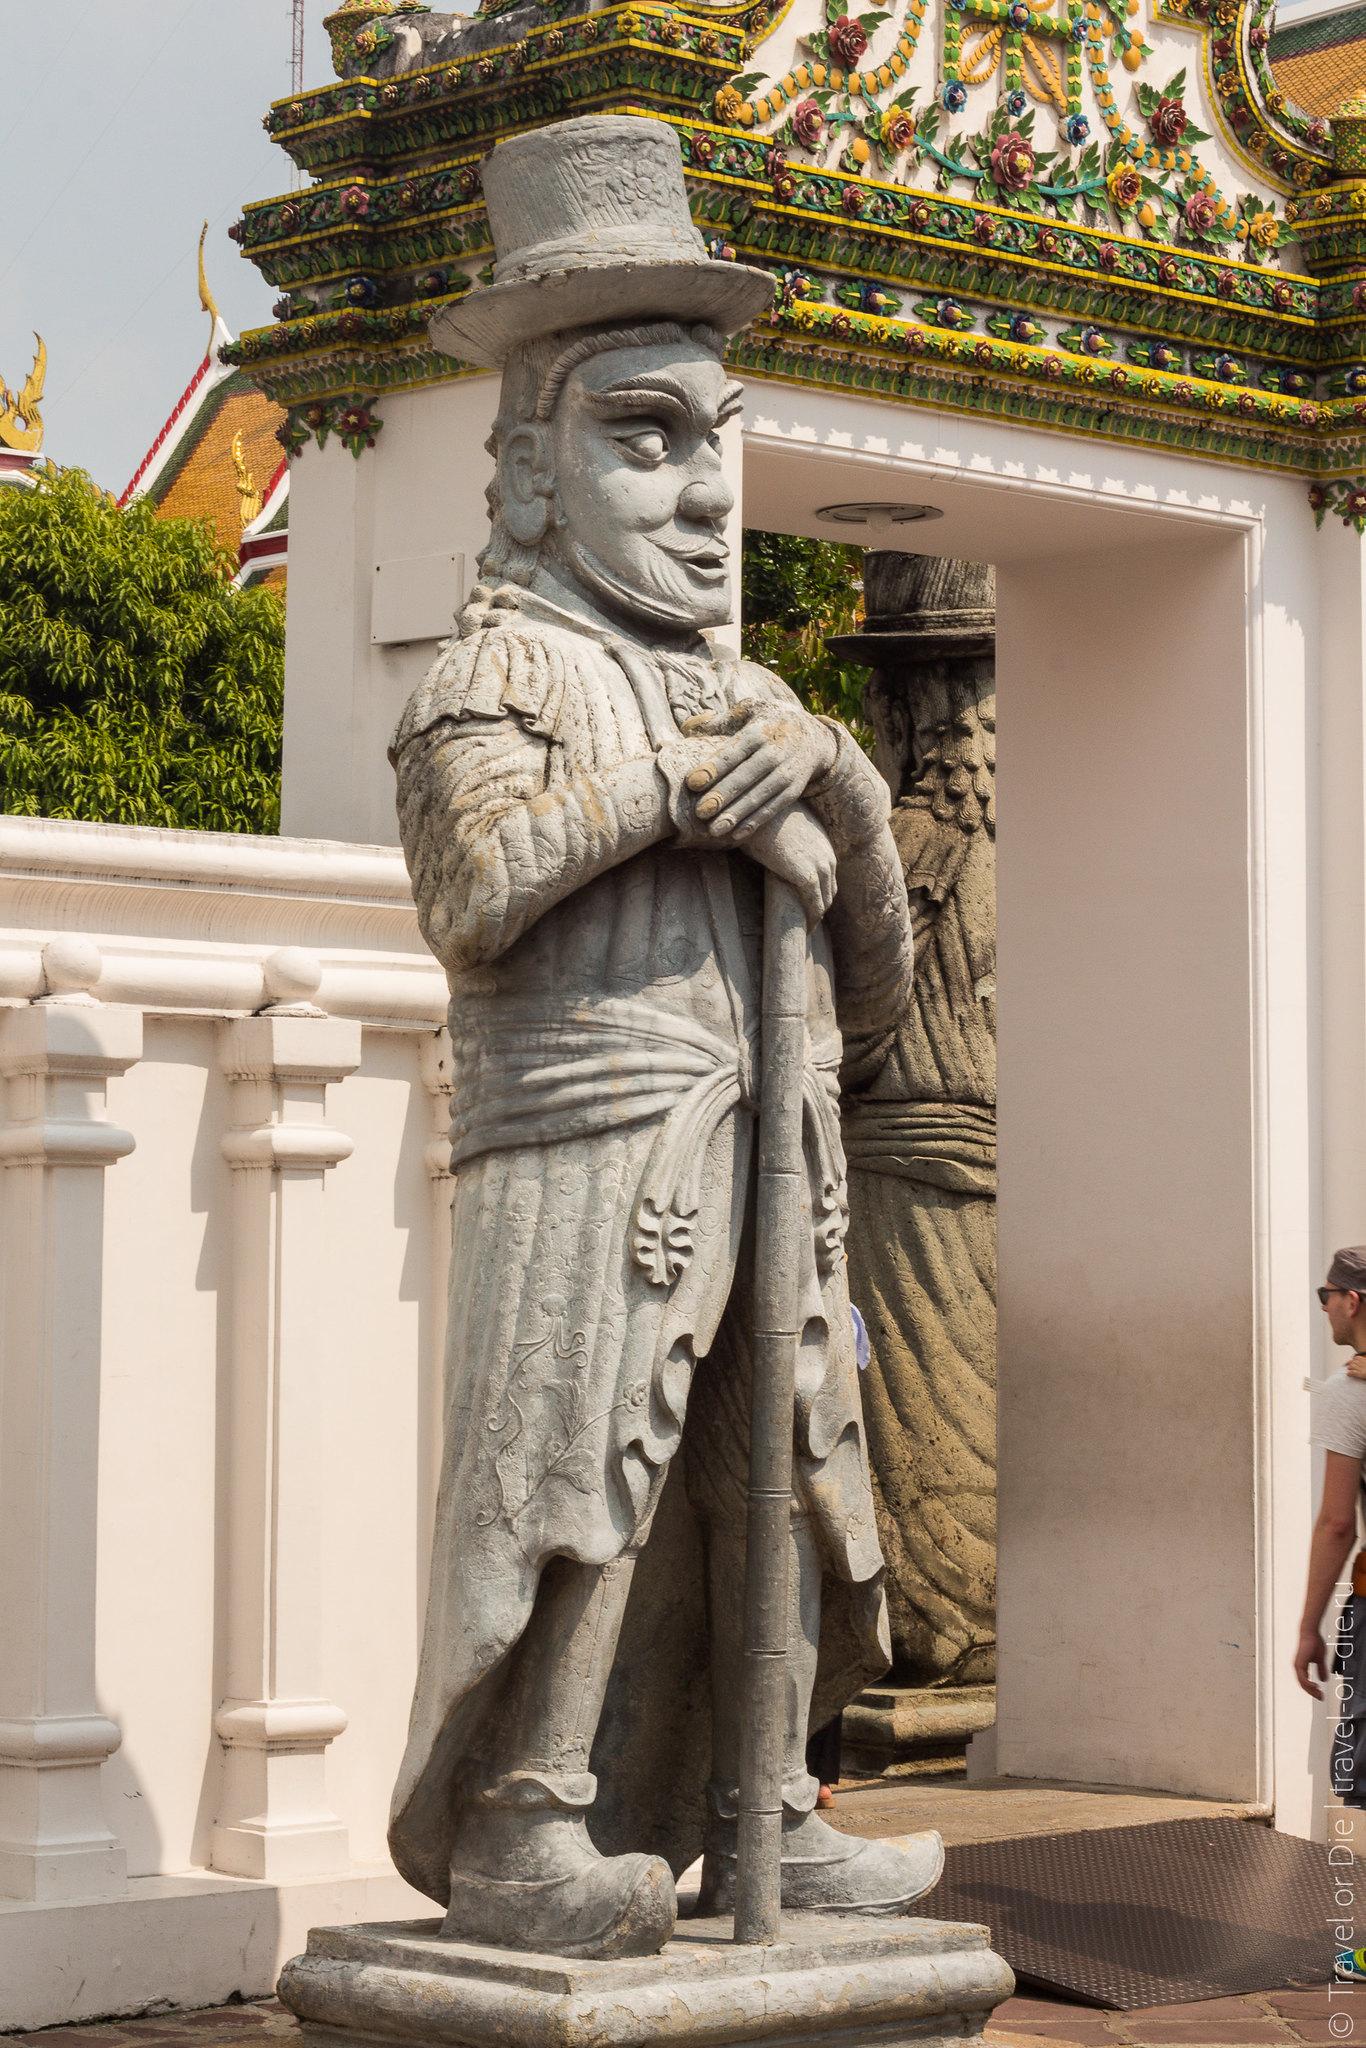 Wat-Pho-Bangkok-Храм-Лежащего-Будды-9294